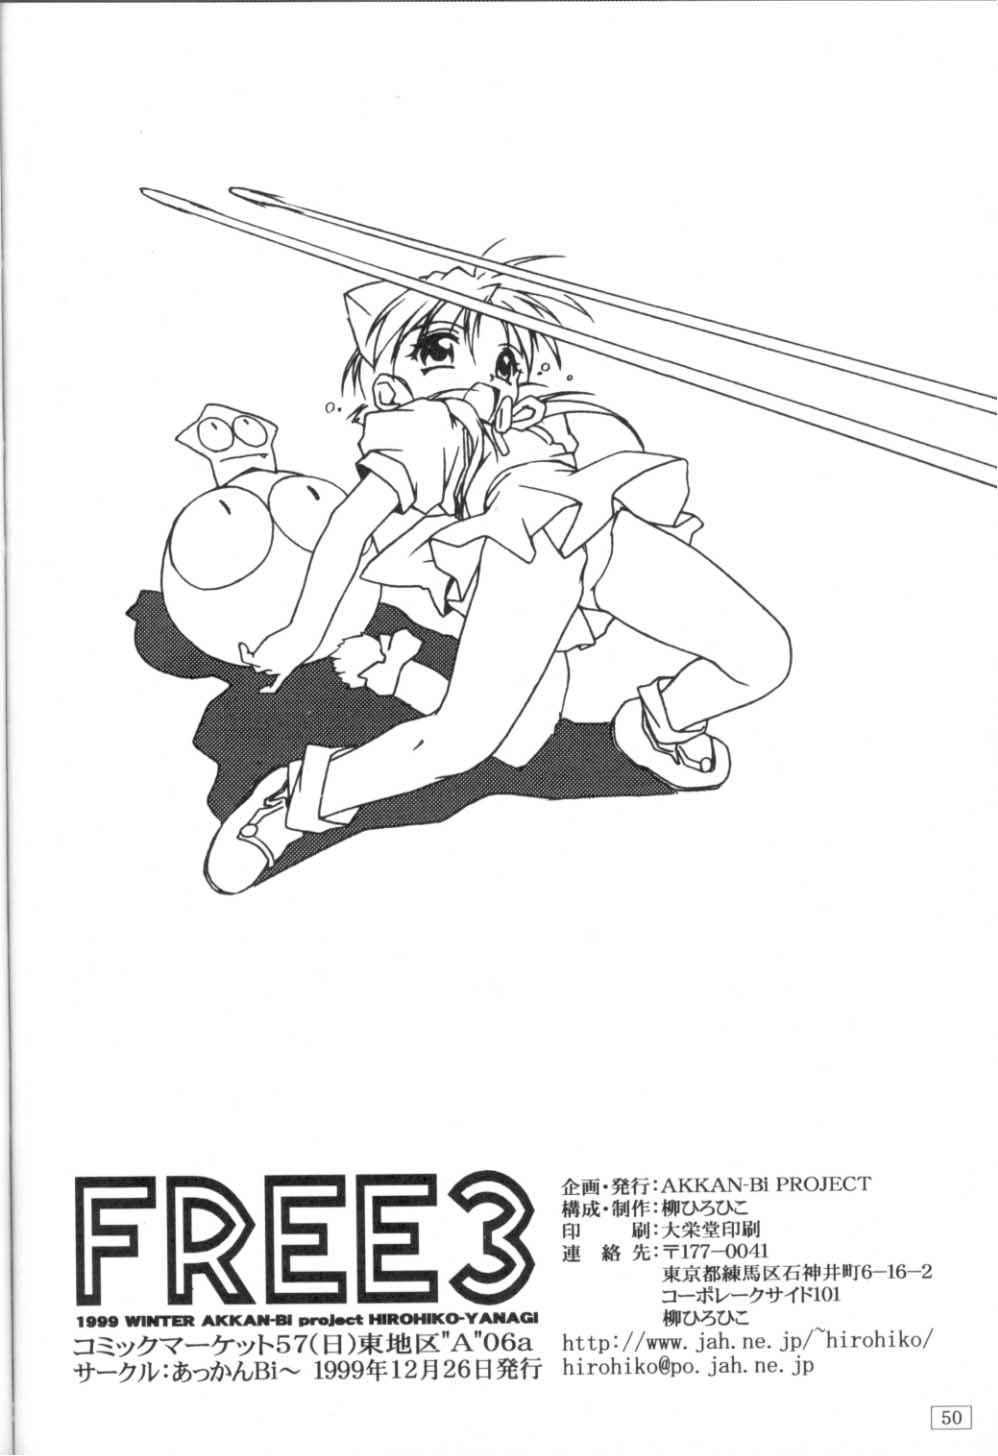 Hirohiko Yanagi - Free3 48